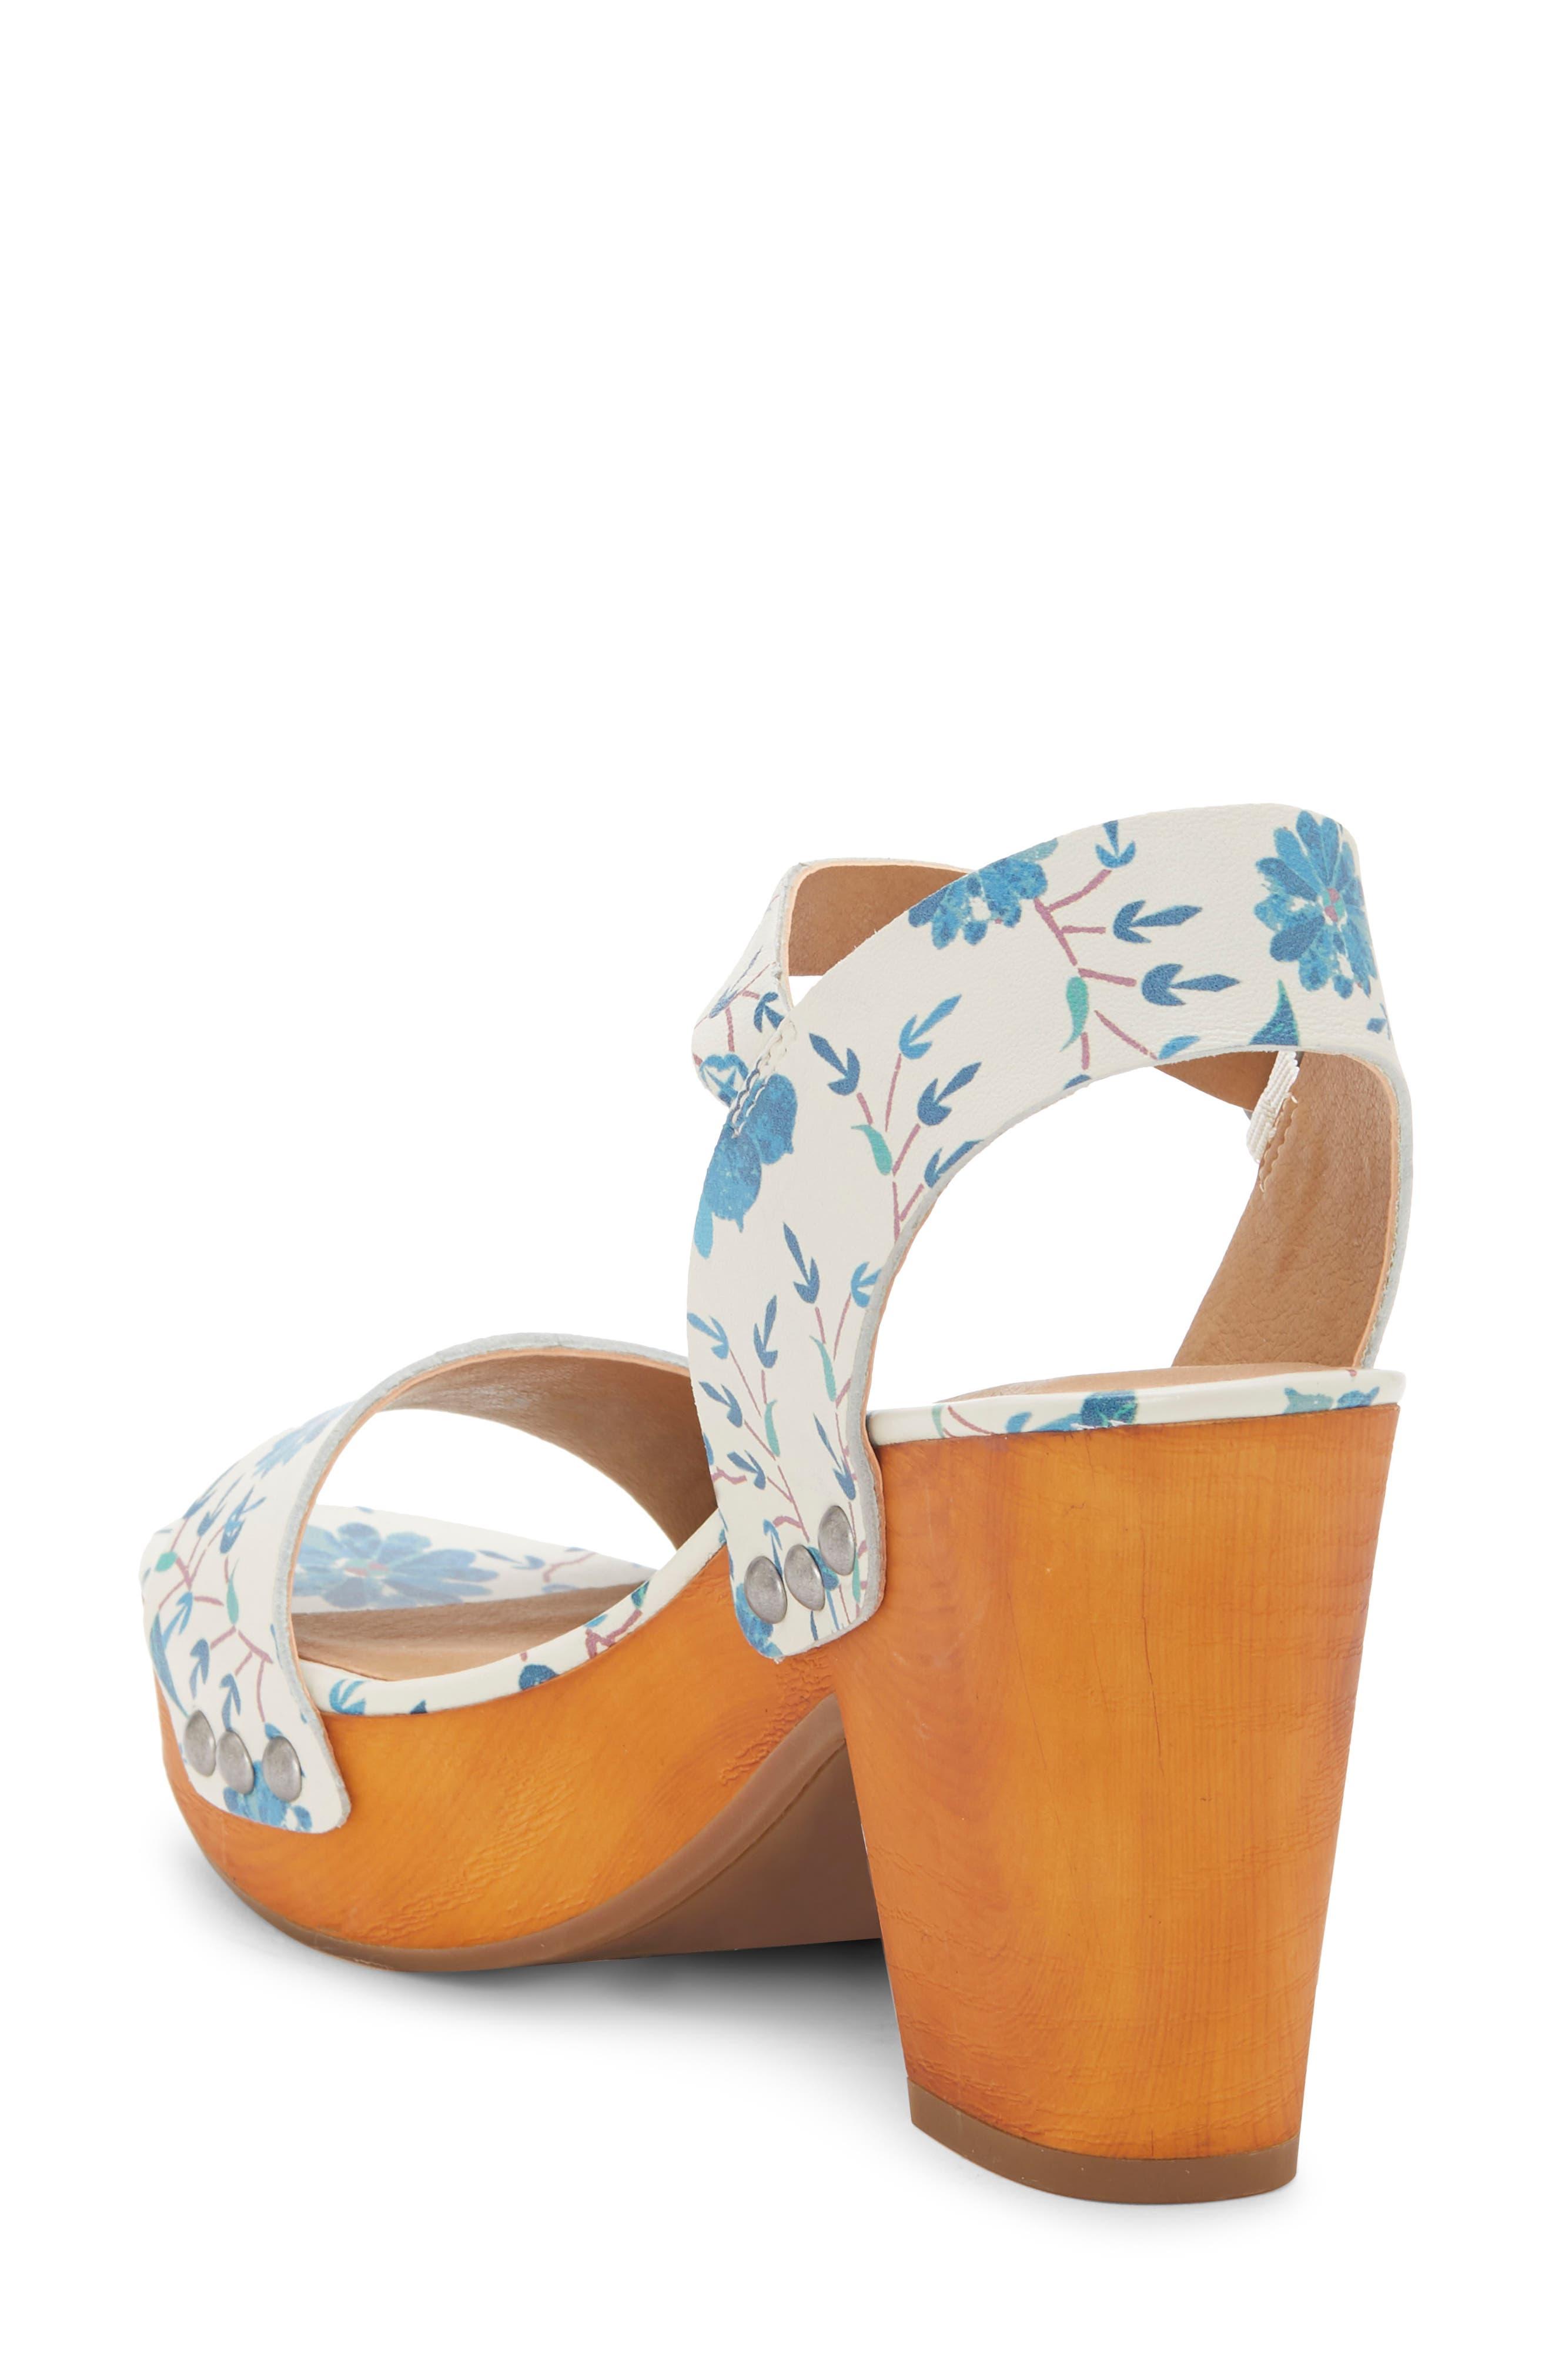 LUCKY BRAND, Trisa Platform Sandal, Alternate thumbnail 2, color, BIRCH LEATHER